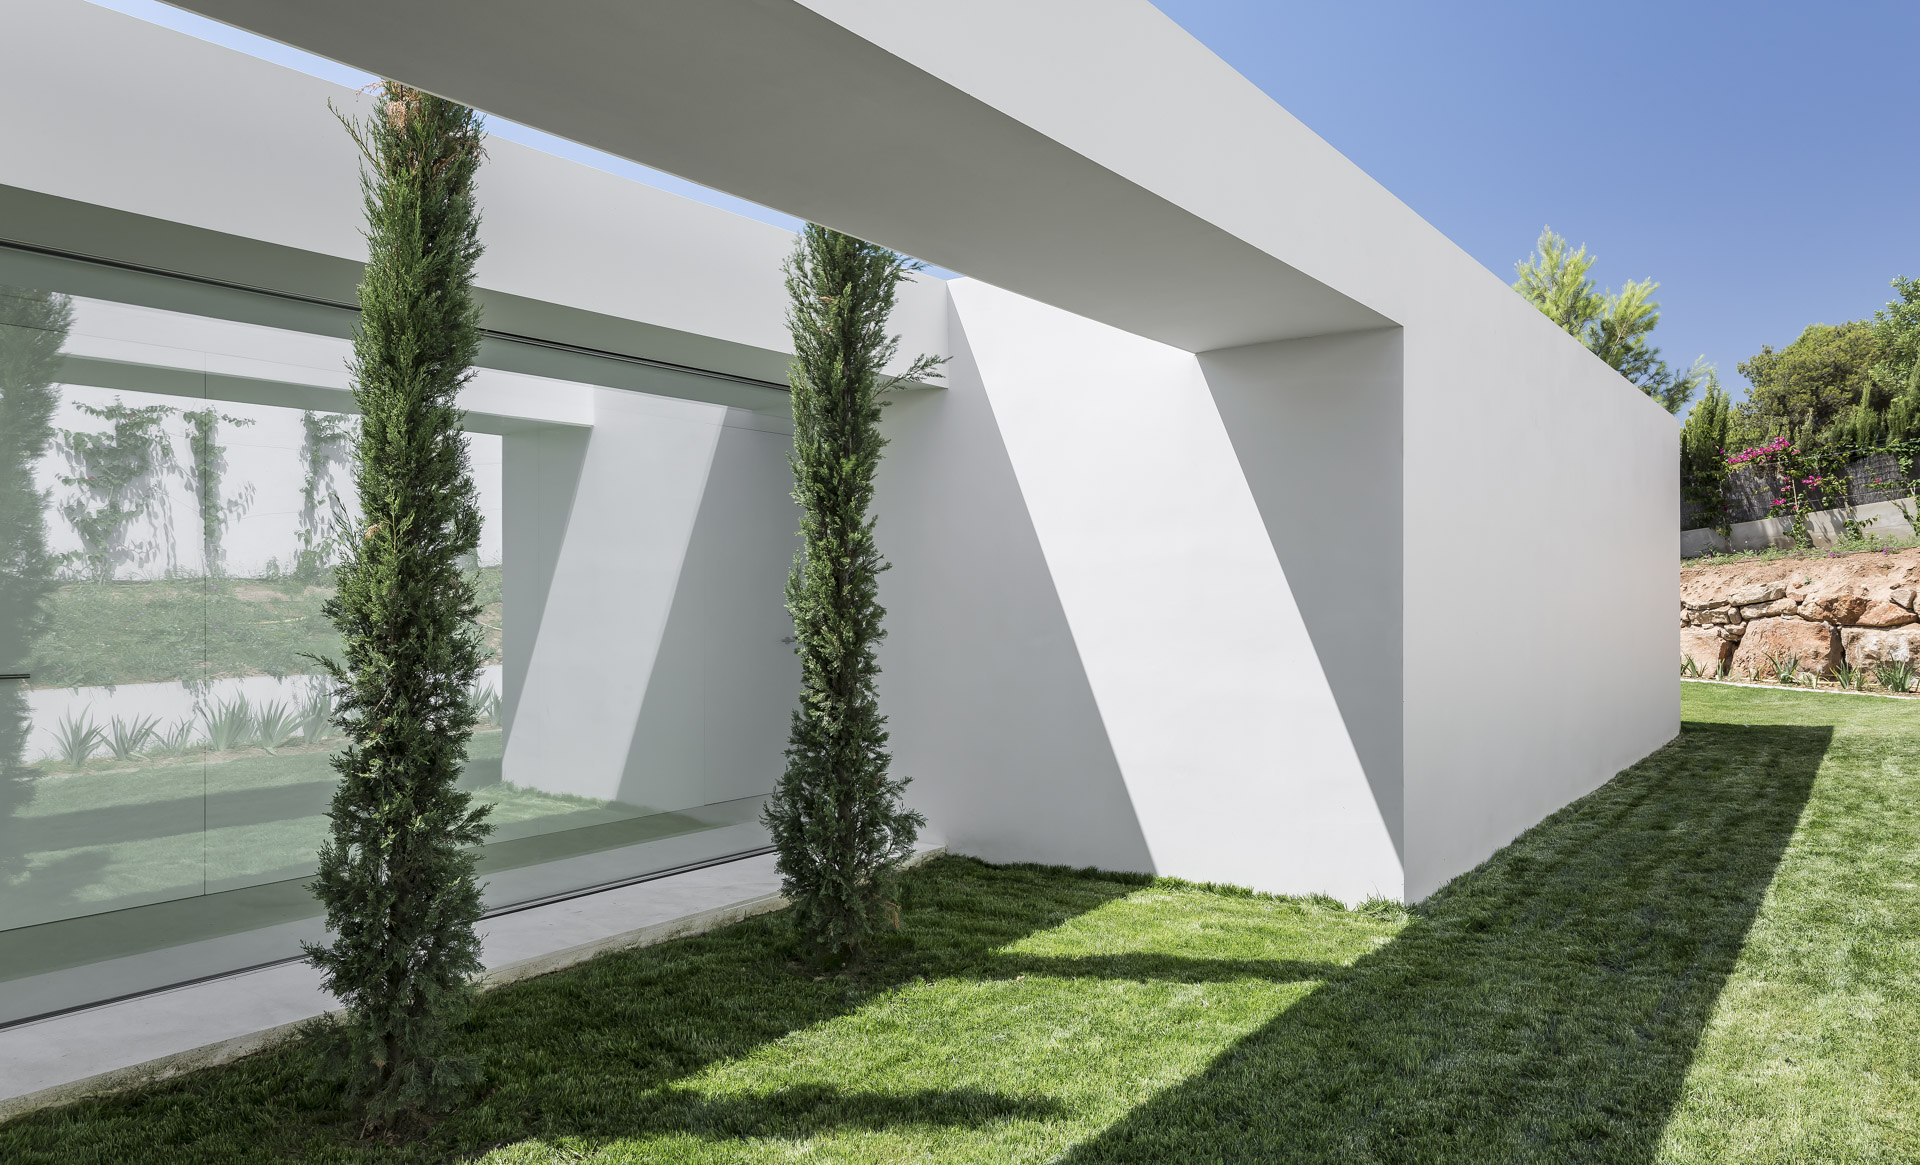 fotografia-arquitectura-valencia-german-cabo-gallardo-llopis-villamarchante-vivienda-06